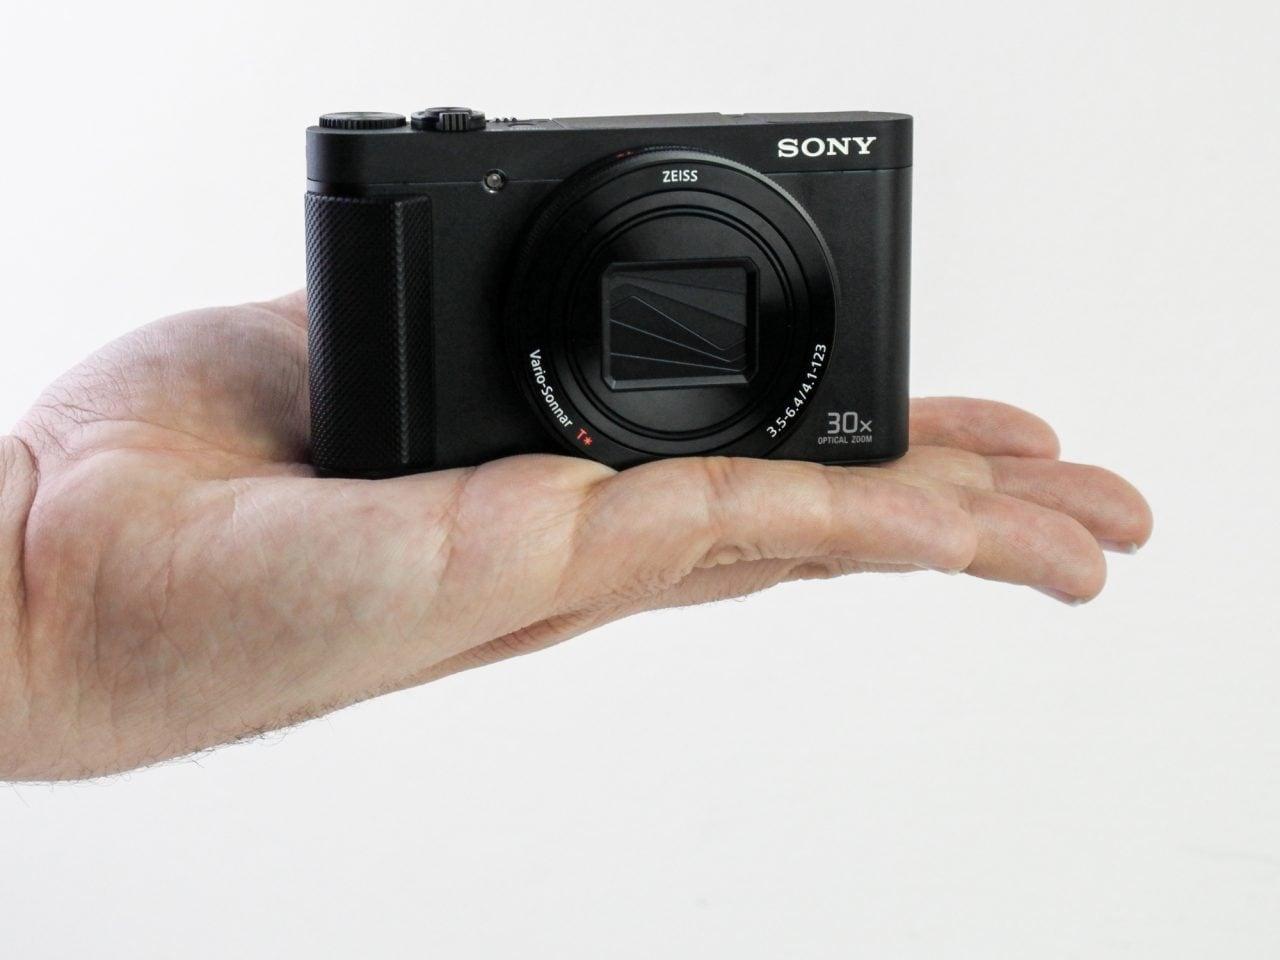 Sony DSC-HX90